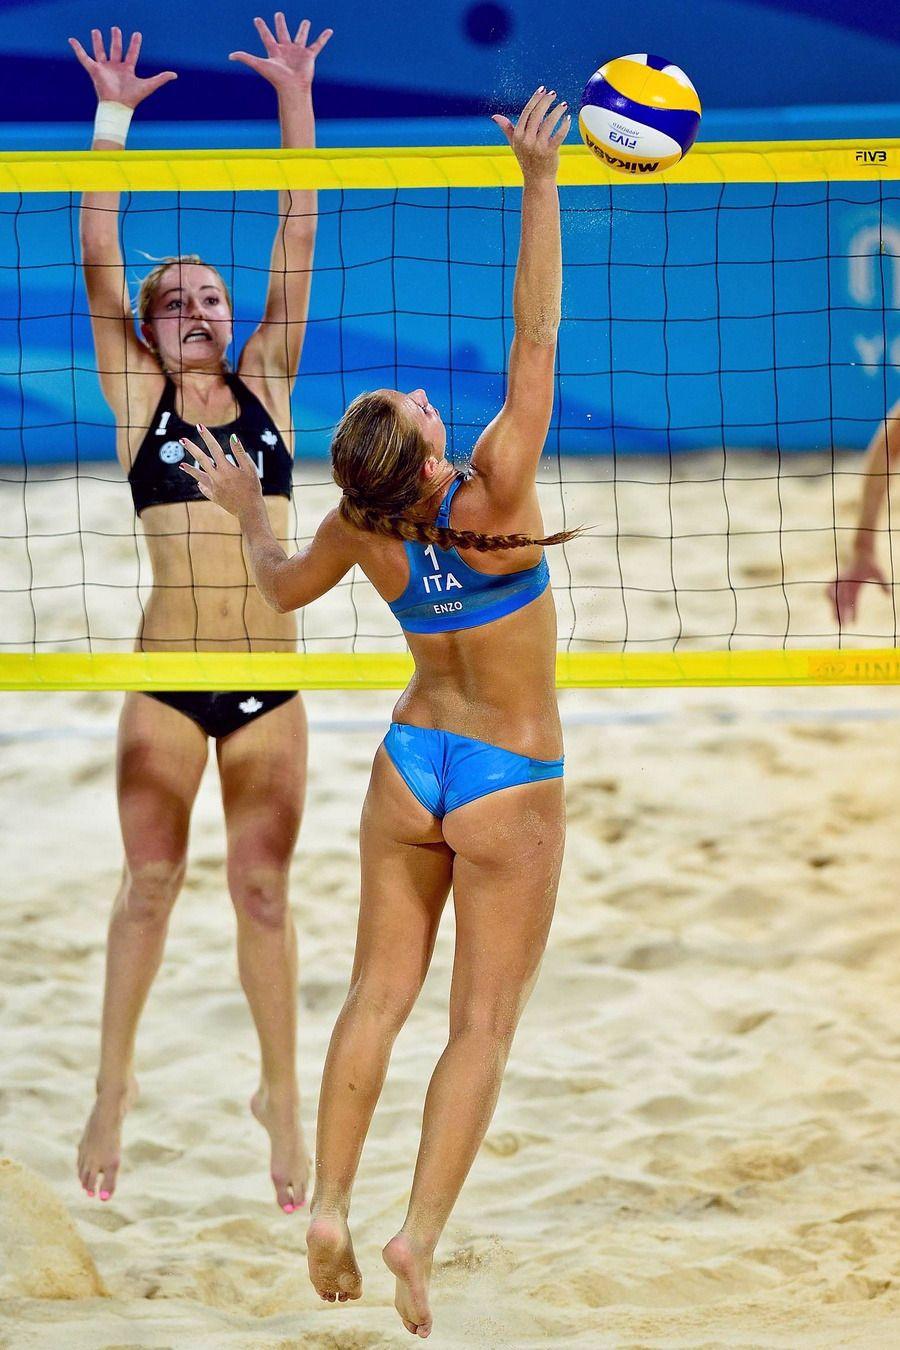 Irene Enzo Nanjing 2014 Youth Olympic Games Youth Olympic Games Olympic Games Beach Volleyball